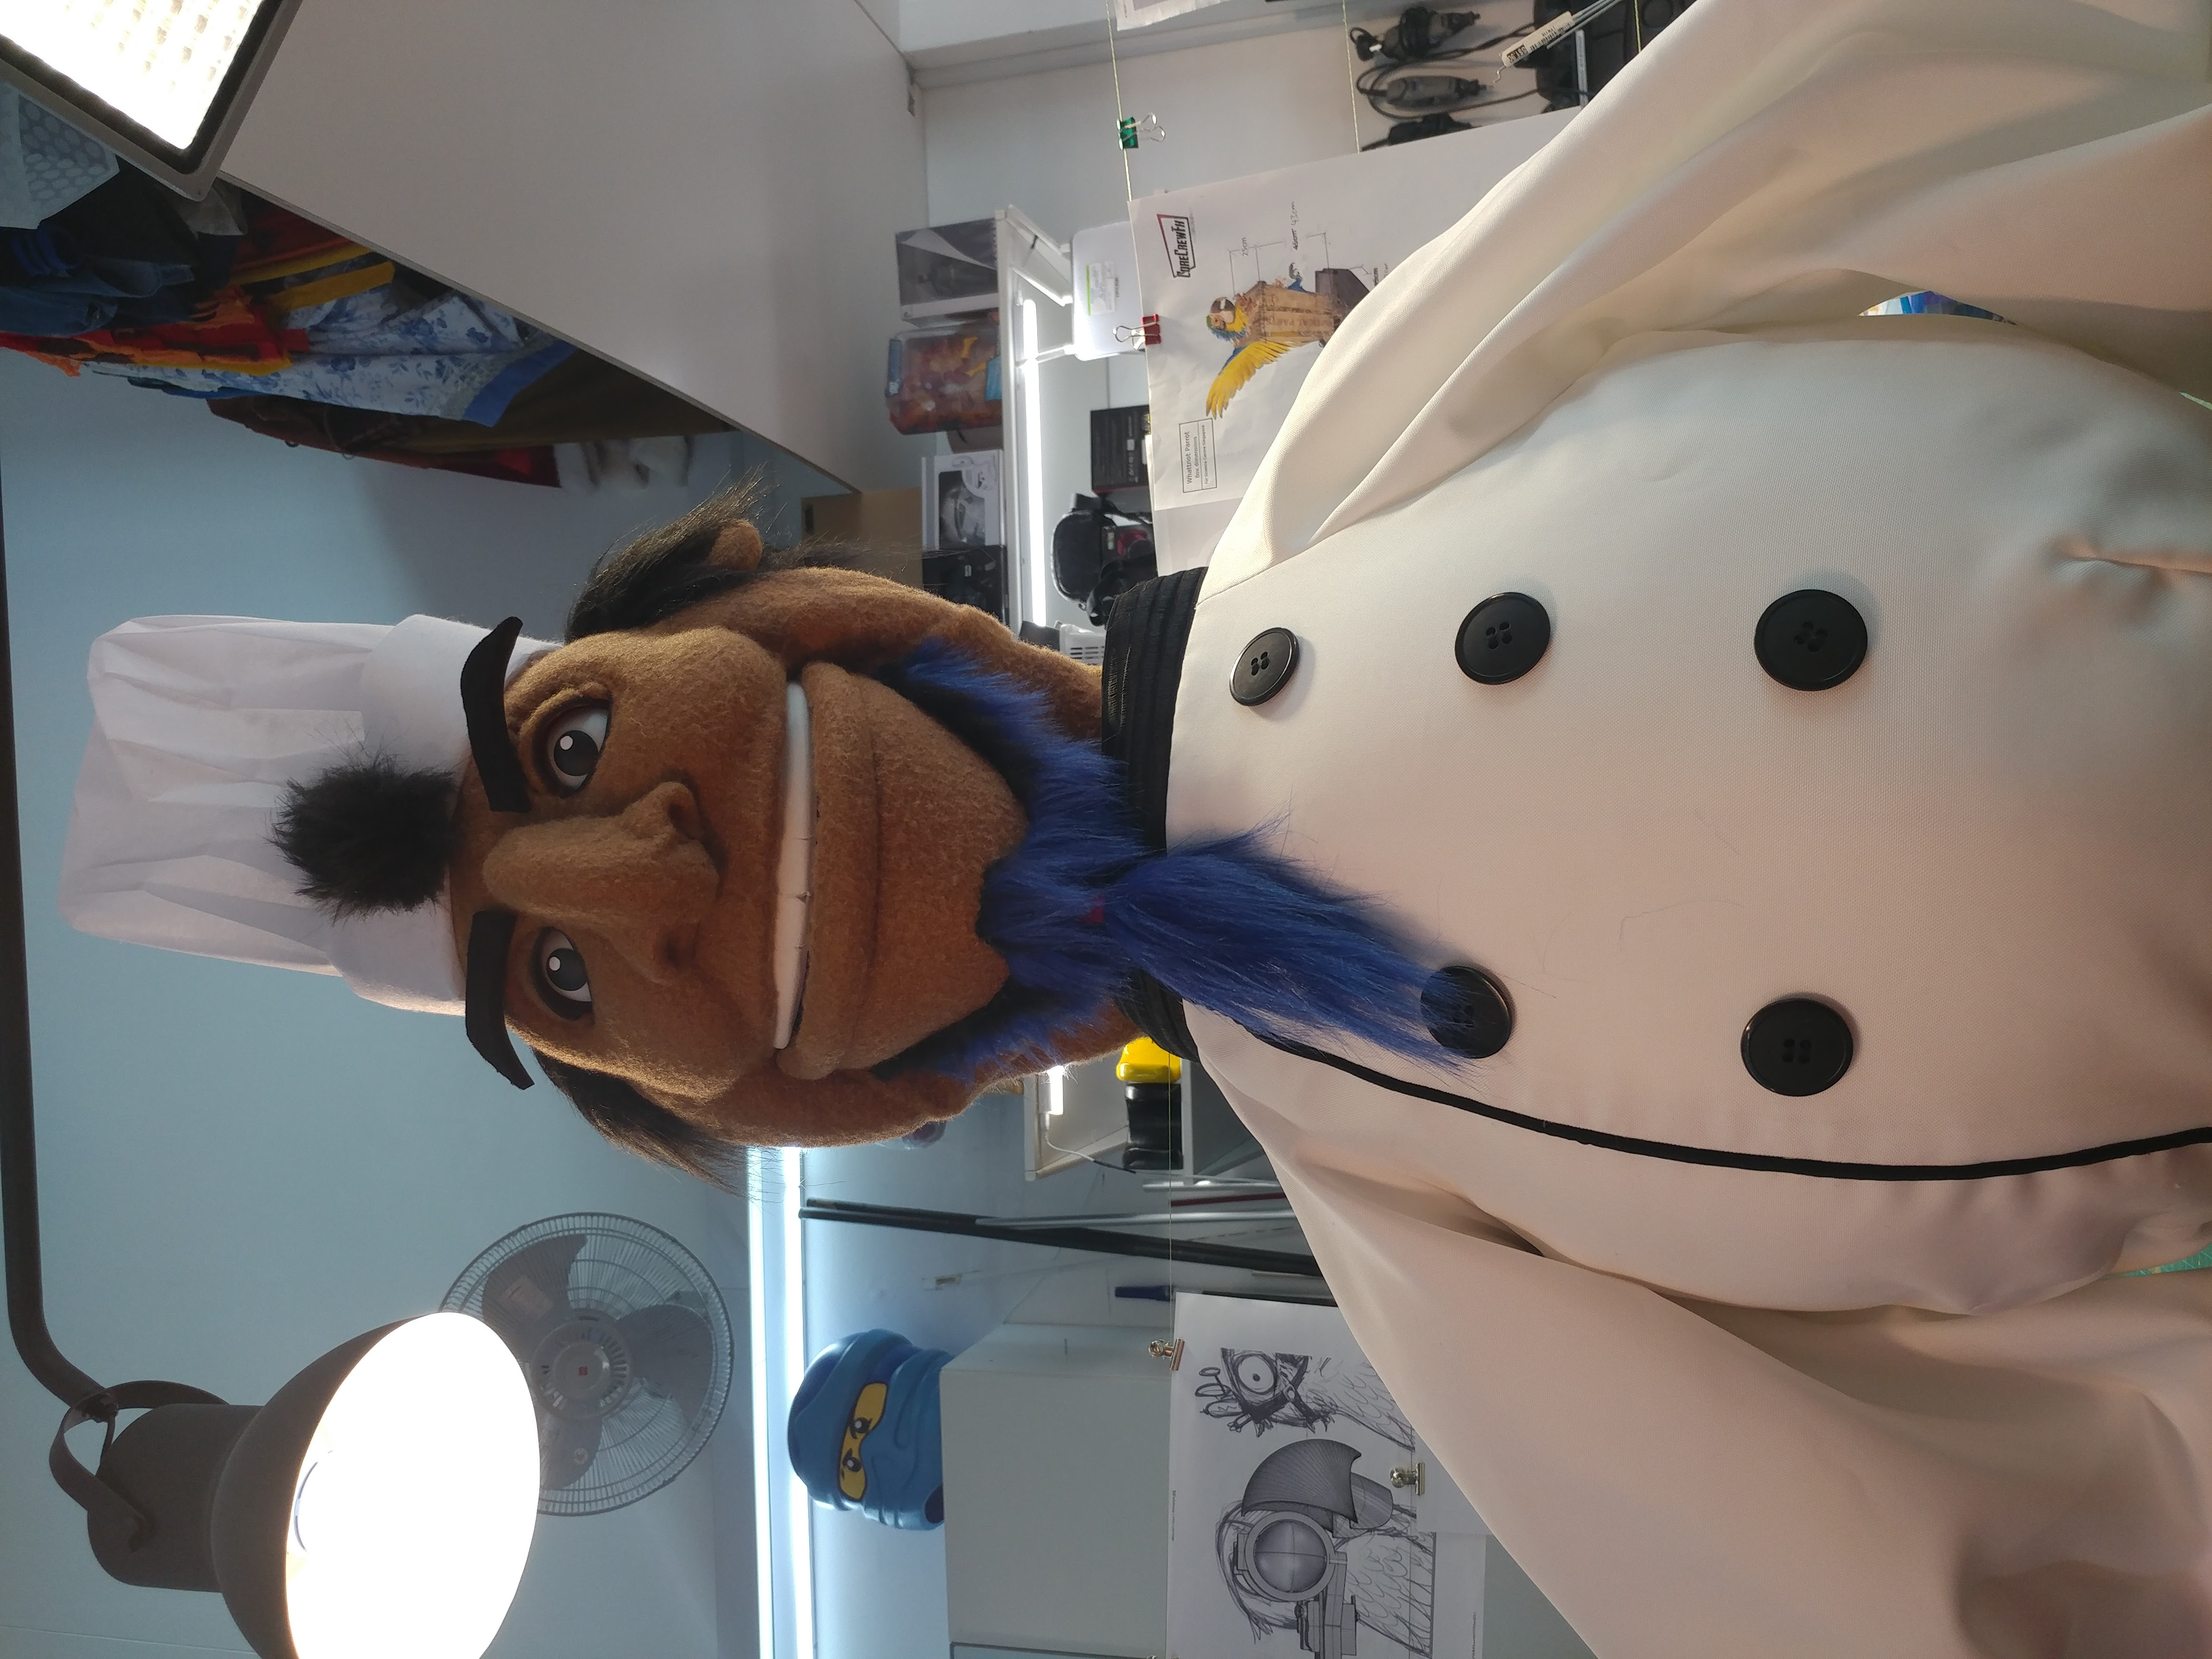 Chef Bluebeard